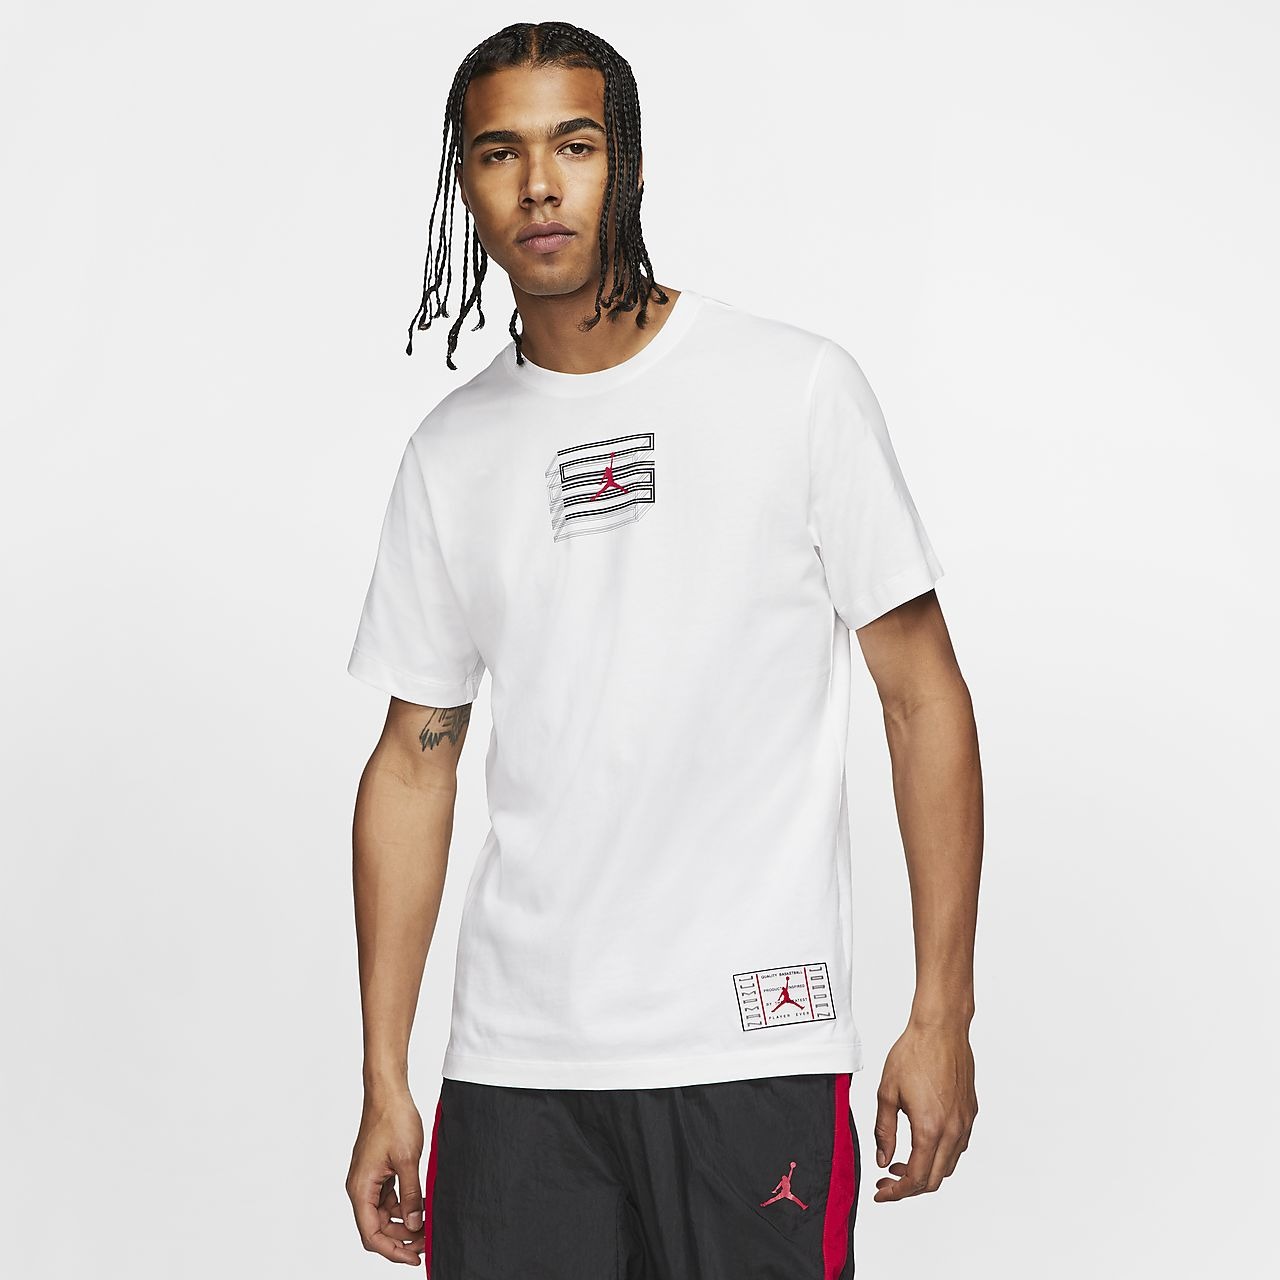 Tee-shirt Jordan Legacy AJ11 « 23 »